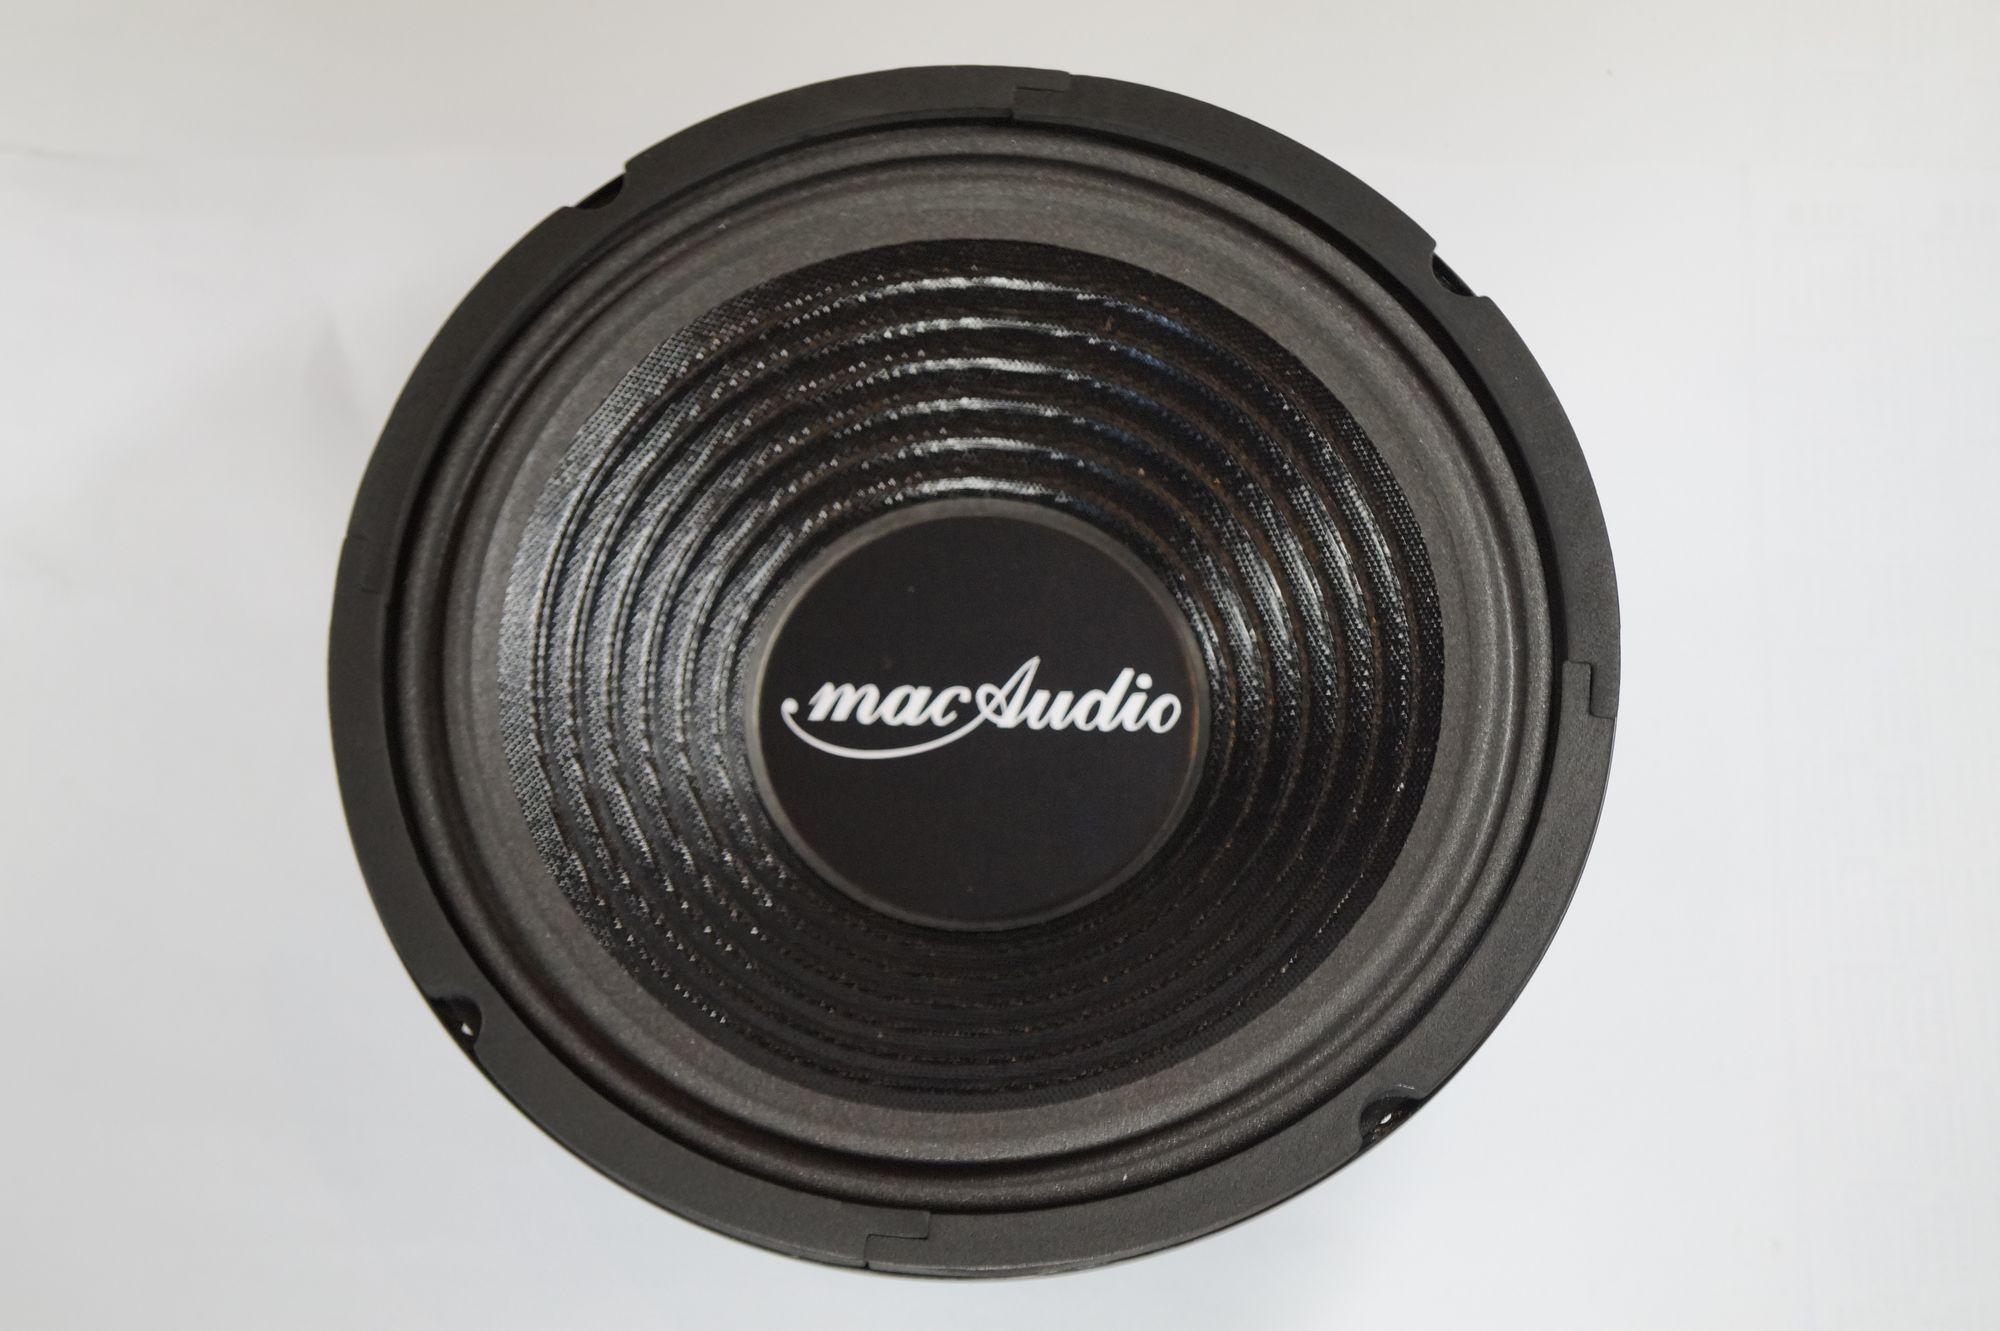 Mac Audio Quattro 25,25 cm Subwoofer,Basslautsprecher,Tieftöner